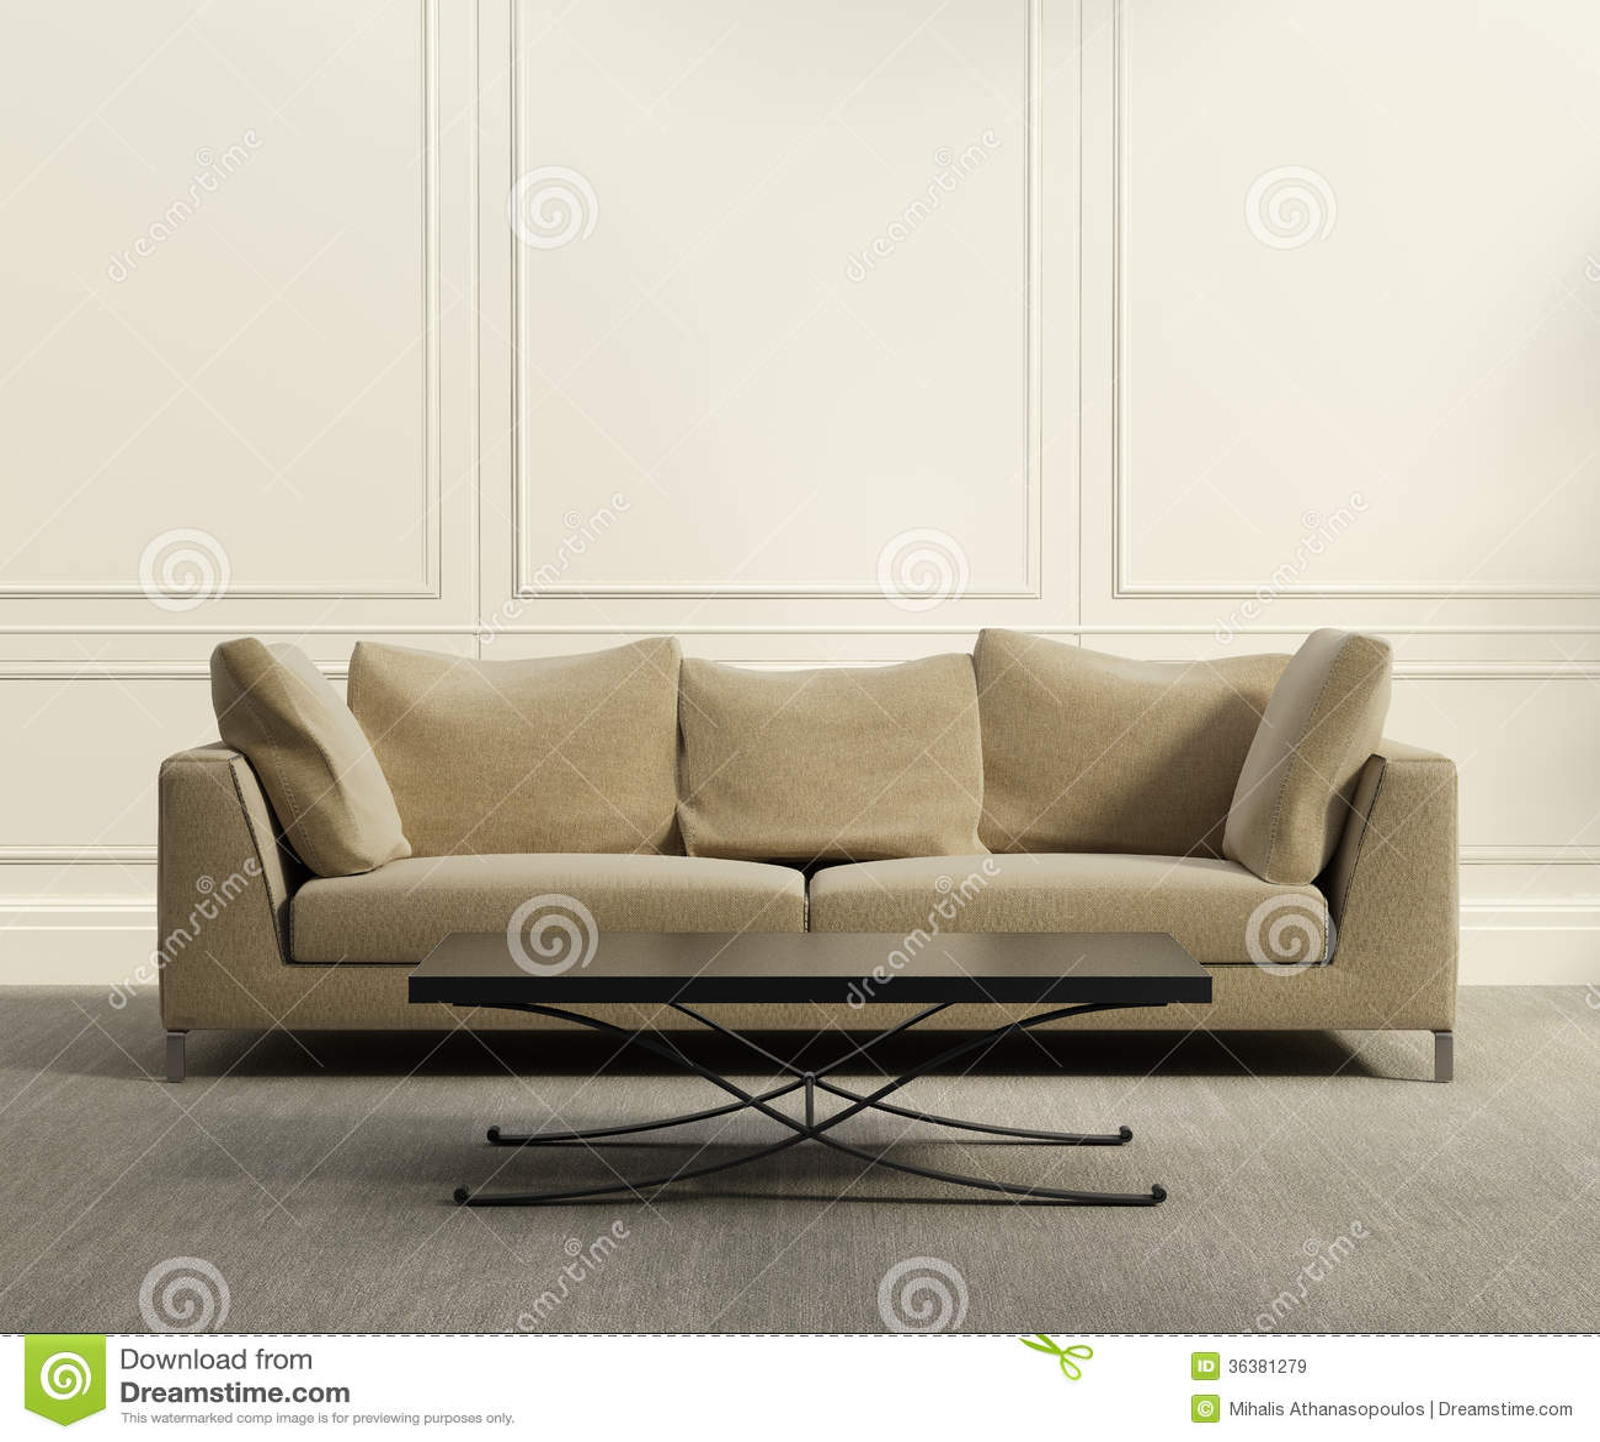 stylish living room furniture sofas that won t break the bank